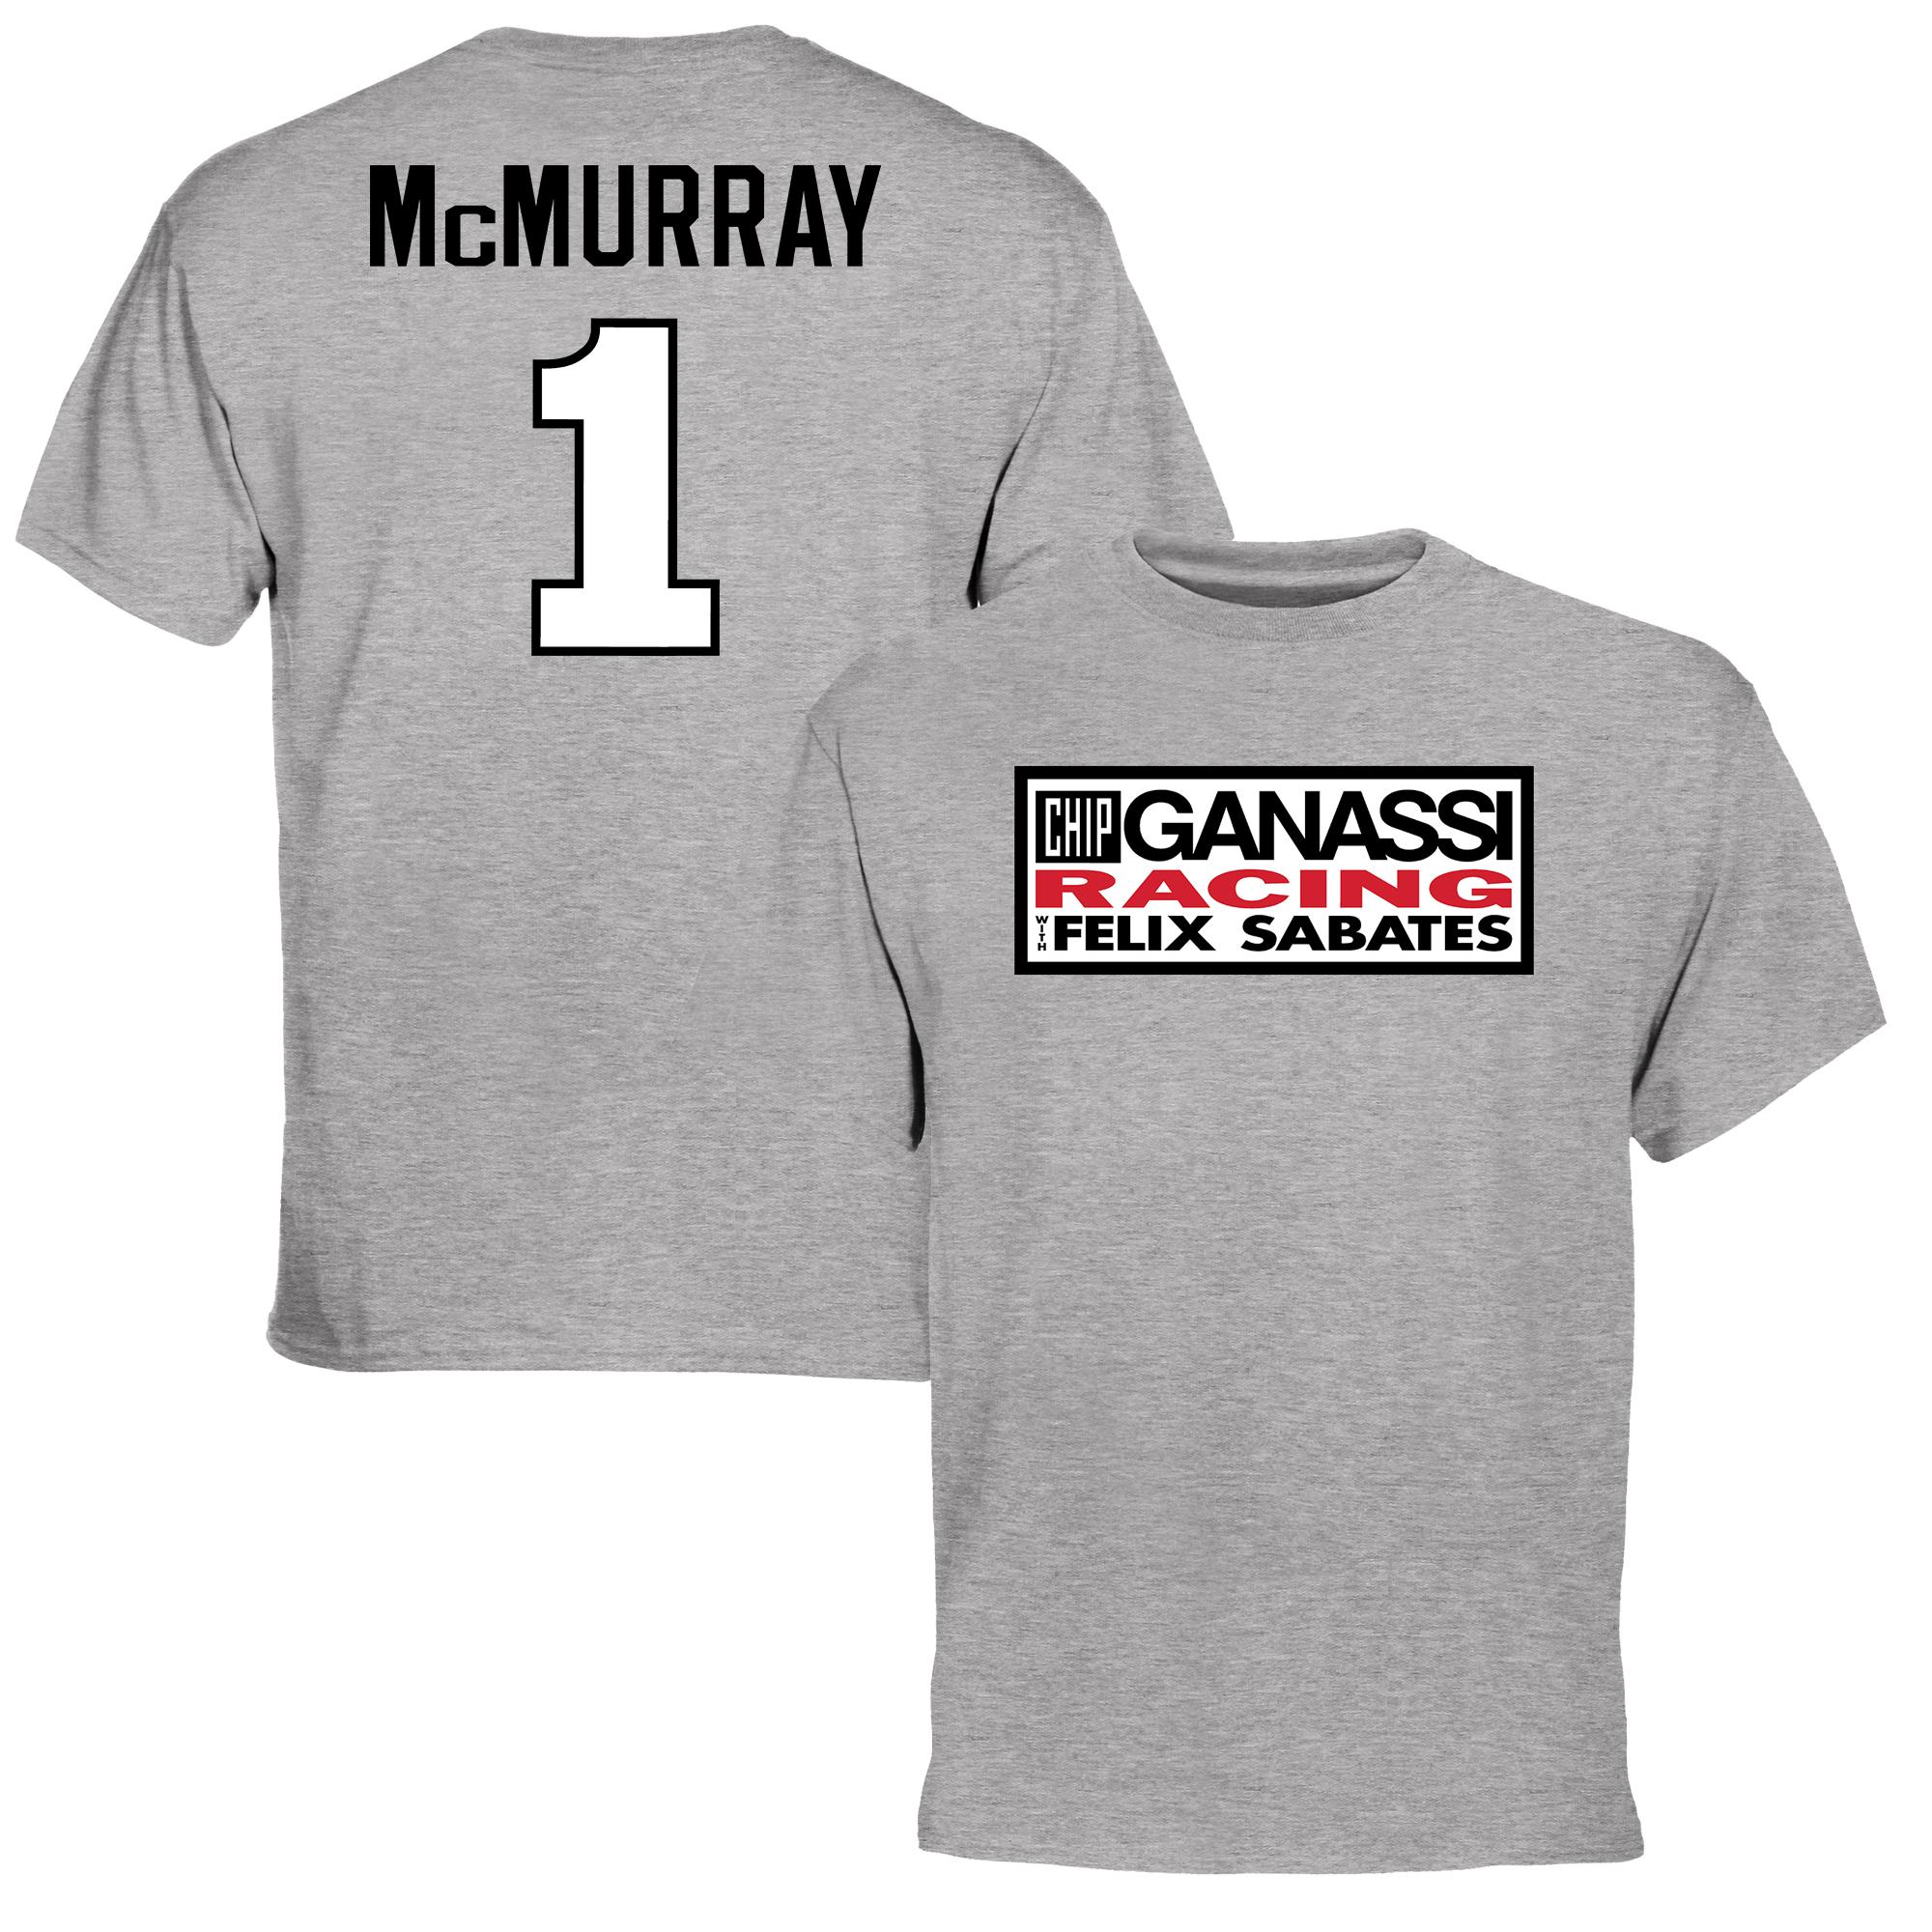 Jamie McMurray Driver Name & Number T-Shirt - Ash